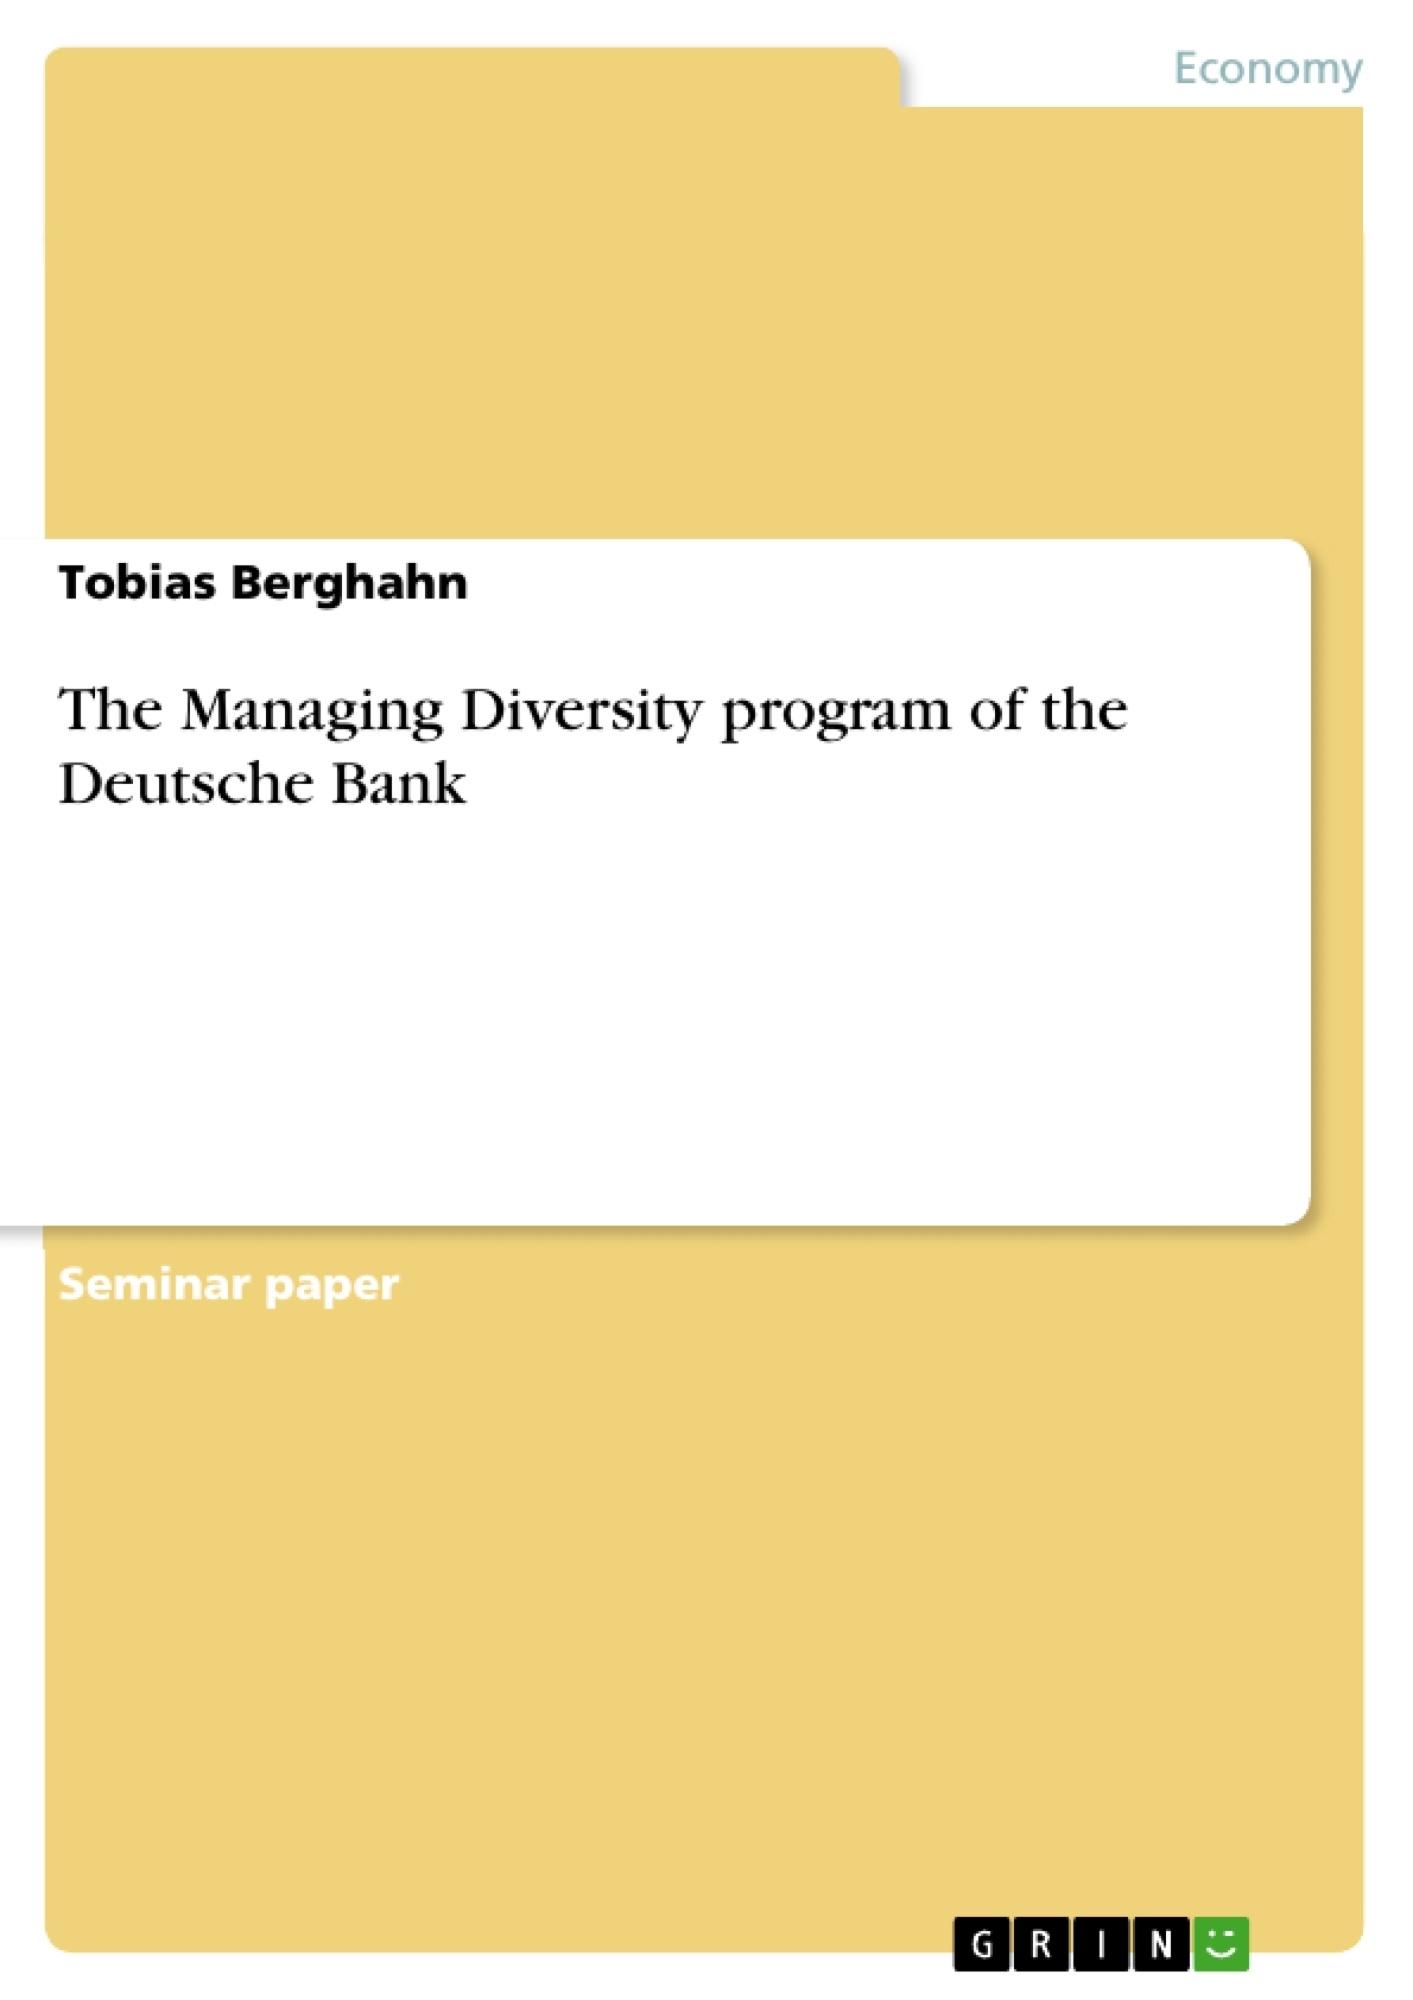 Title: The Managing Diversity program of the Deutsche Bank